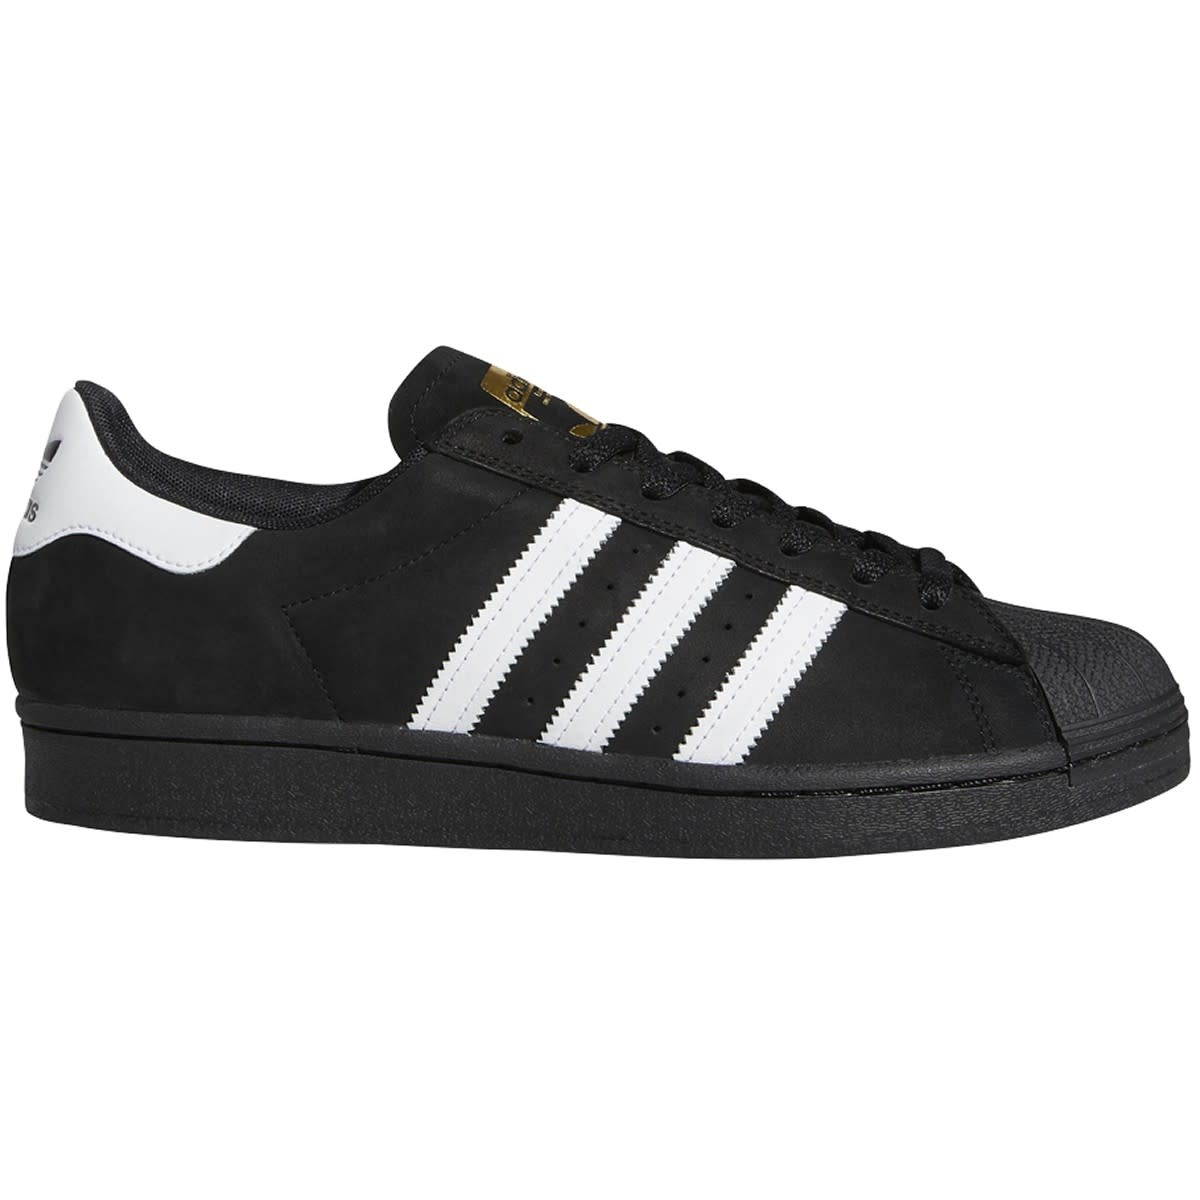 Adidas Adidas Superstar ADV - Black